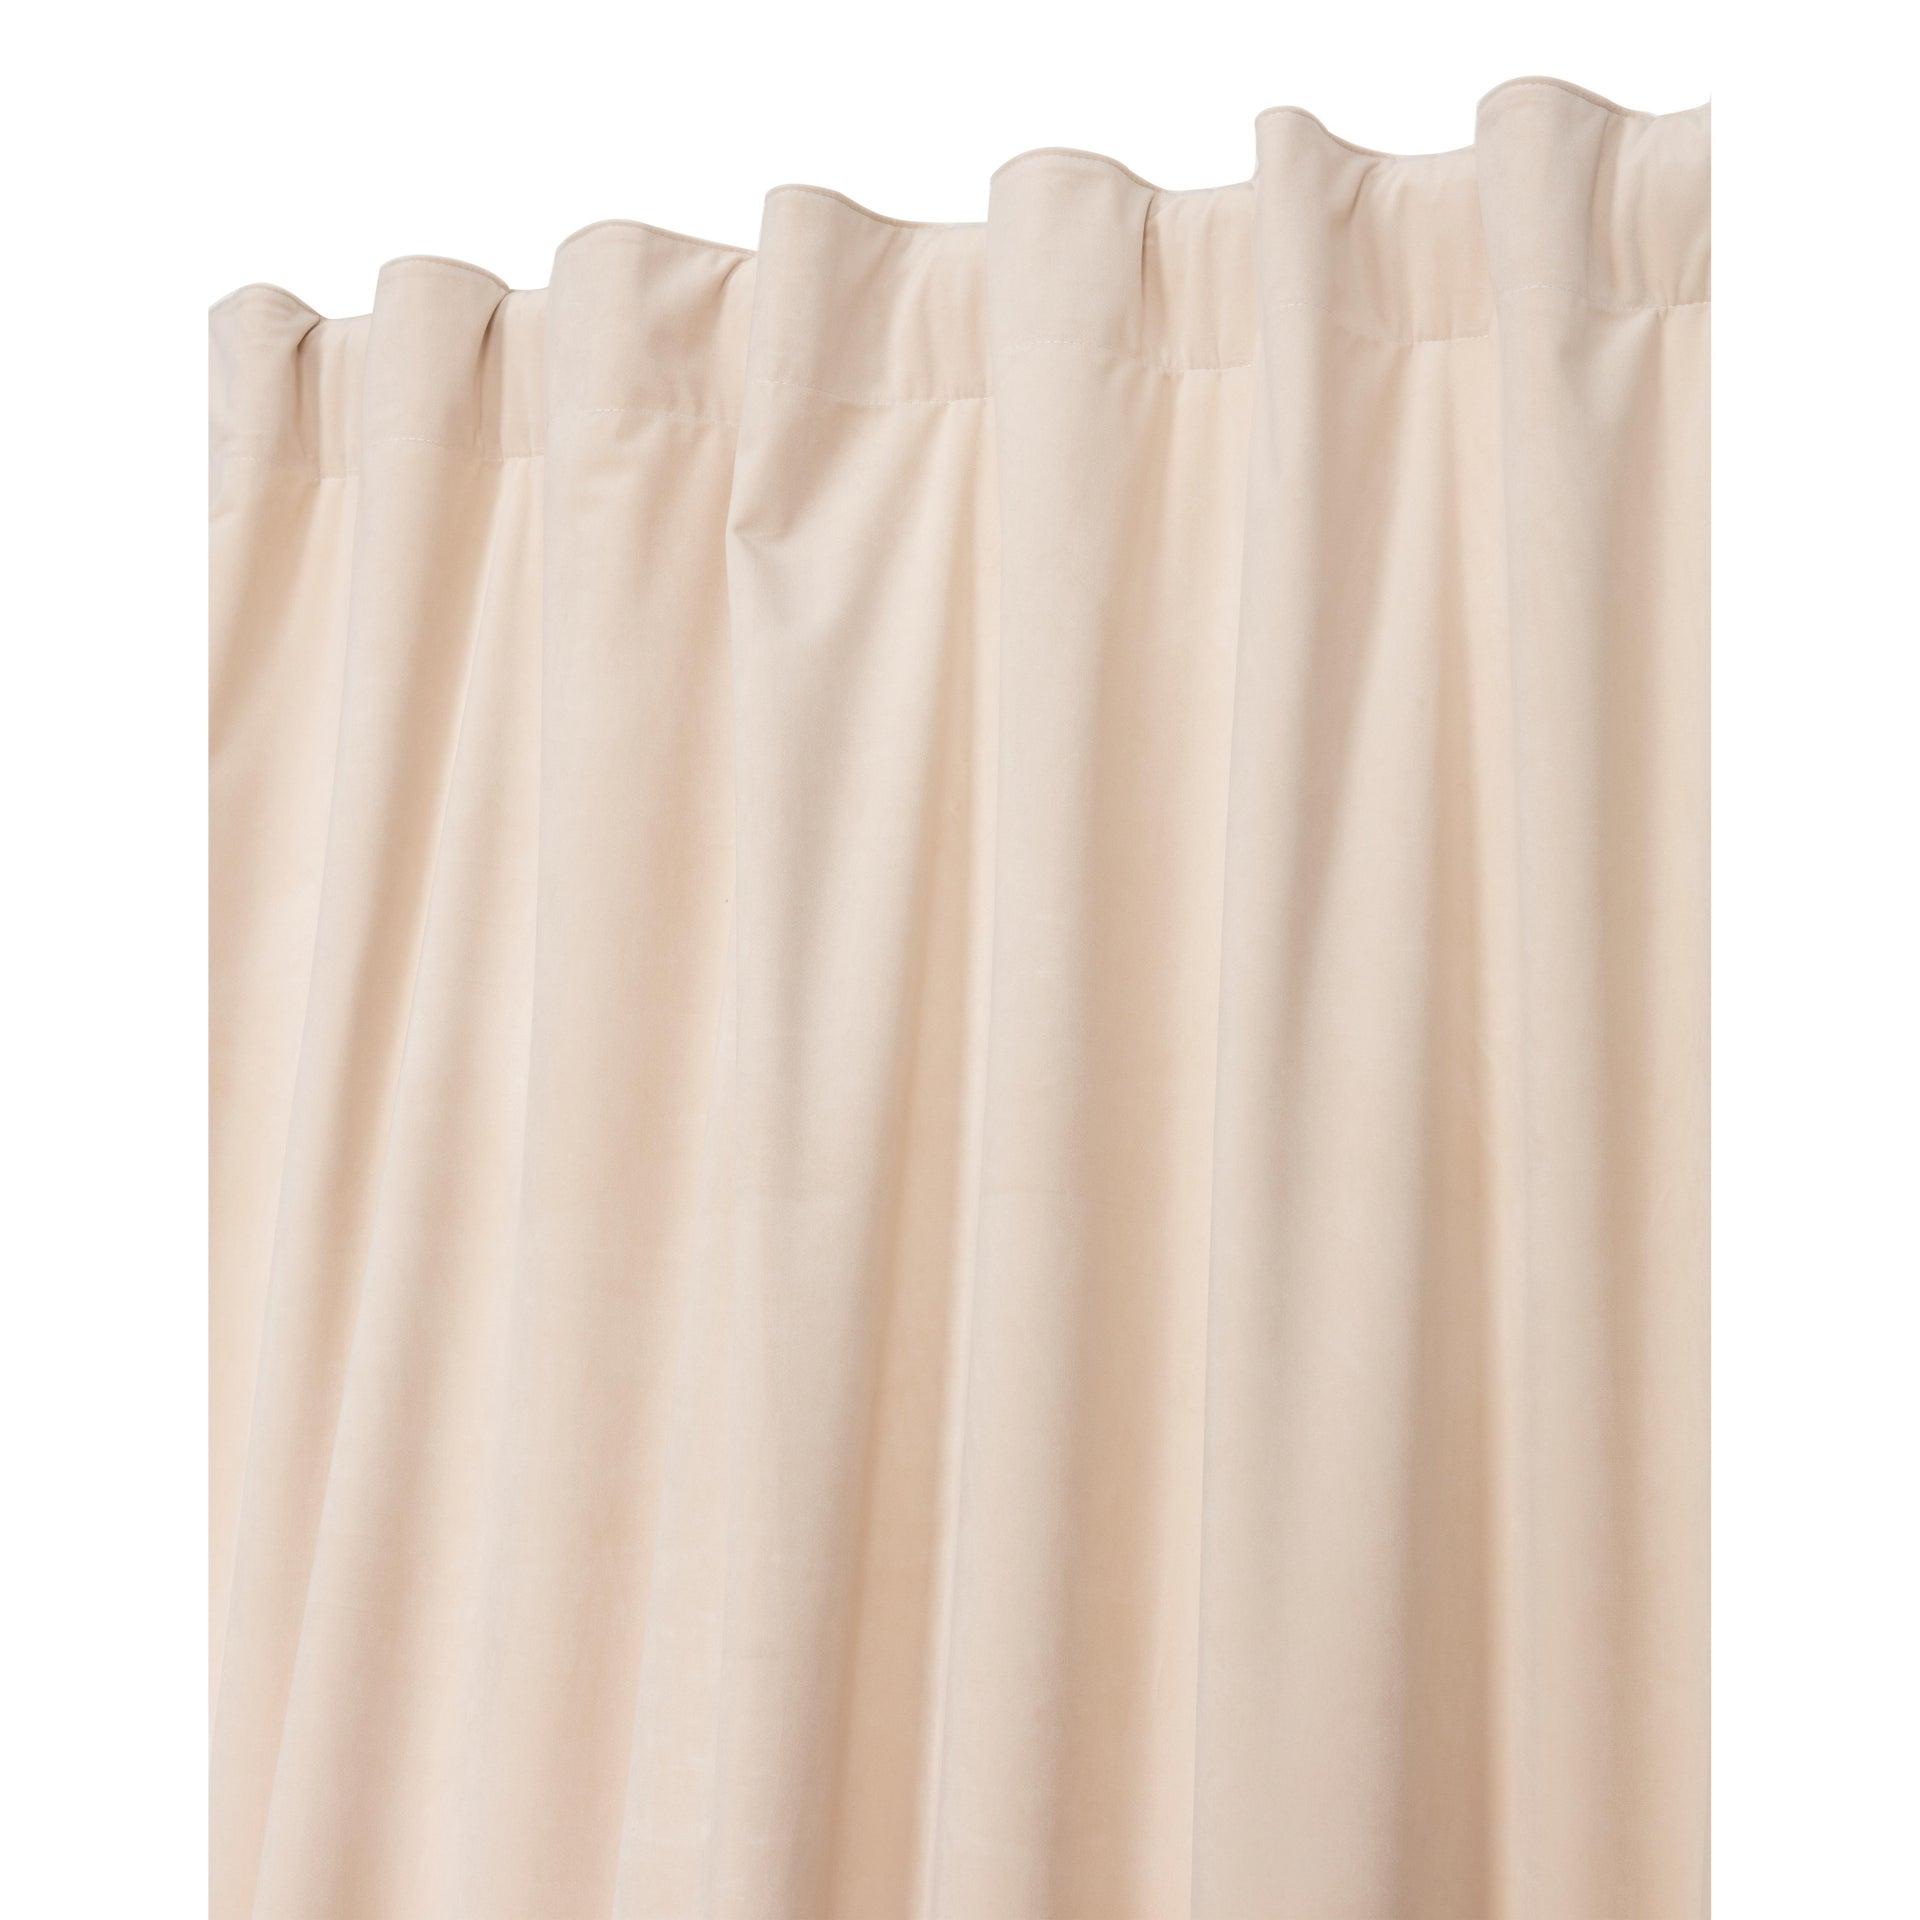 Tenda Misty ecrù passanti nascosti 135 x 280 cm - 5